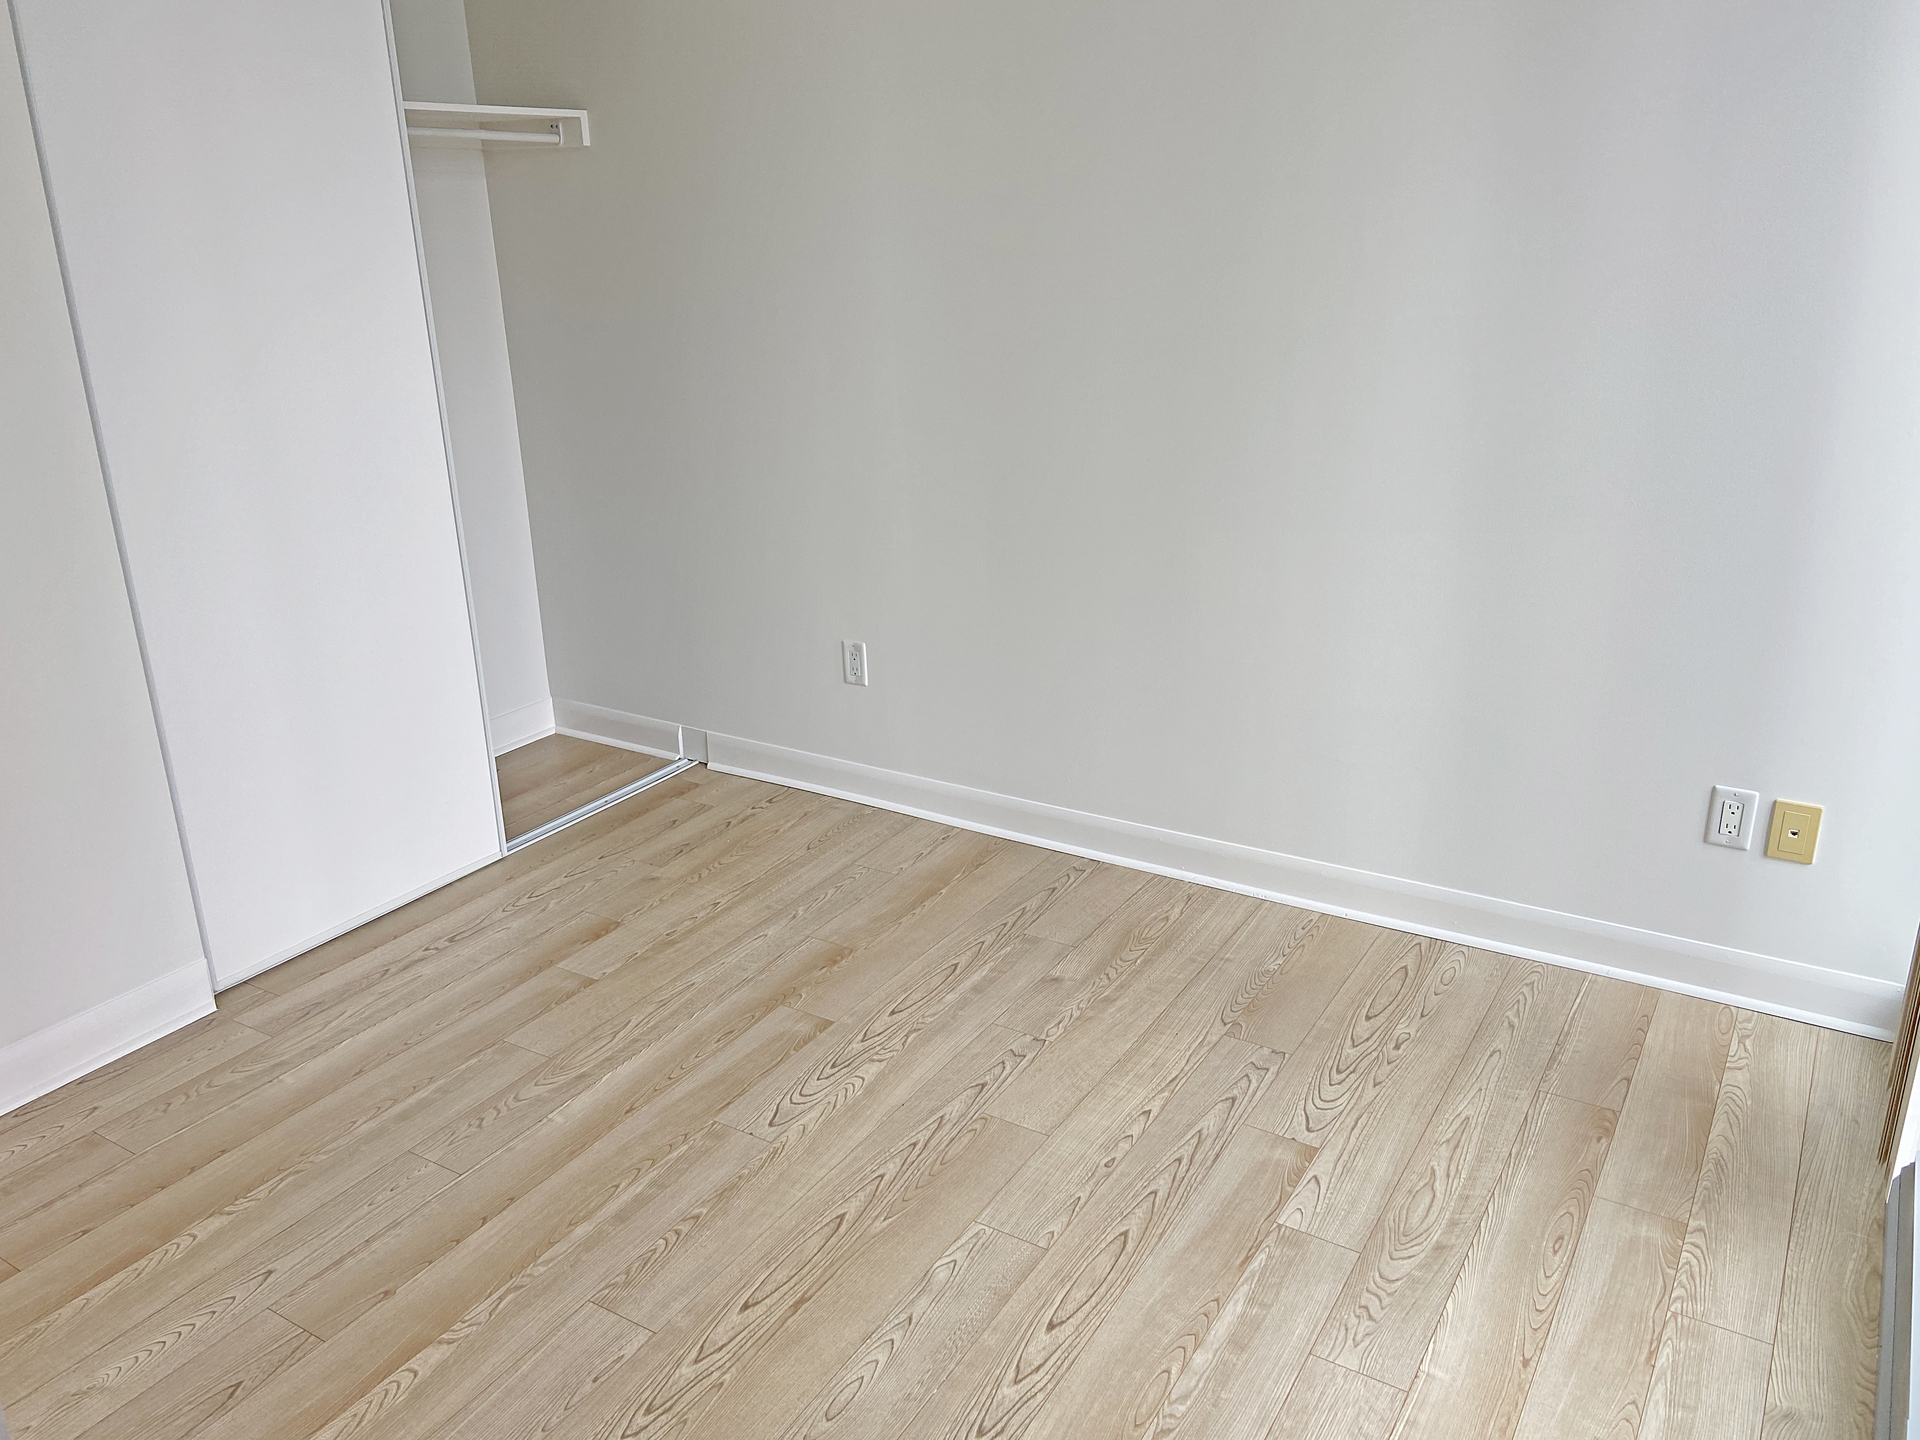 Bedroom at 2207 - 375 King Street W, Waterfront Communities C1, Toronto